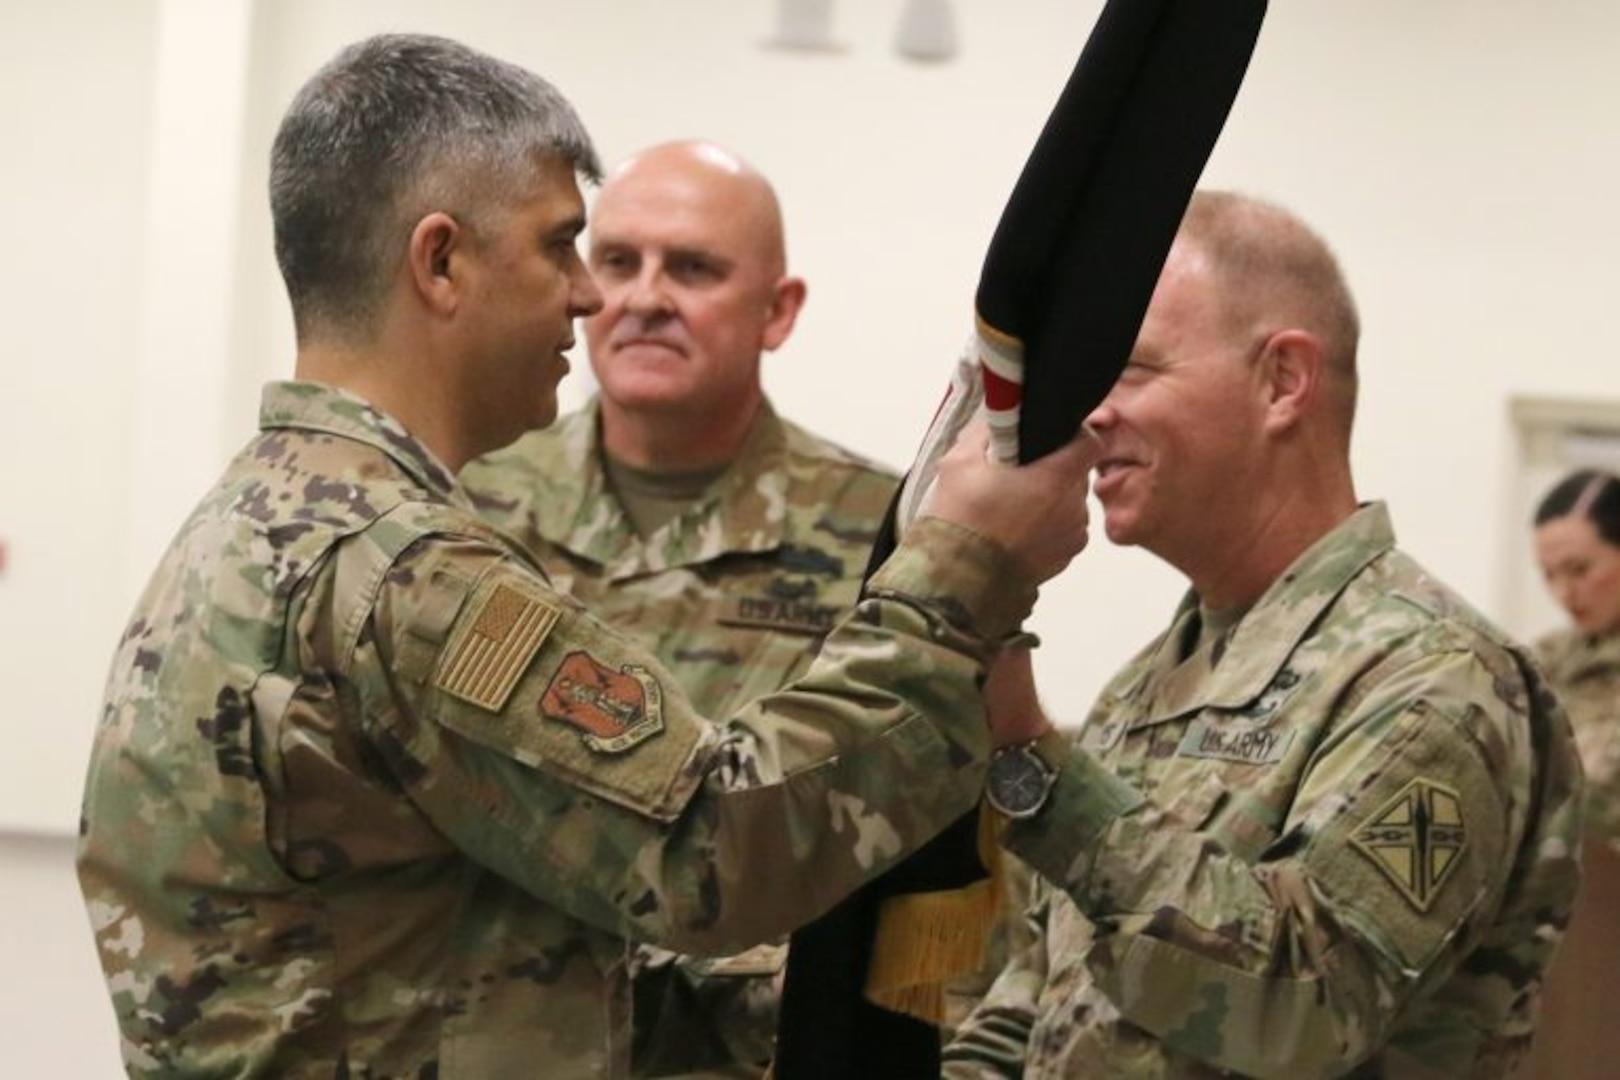 VNG welcomes new command senior enlisted leader